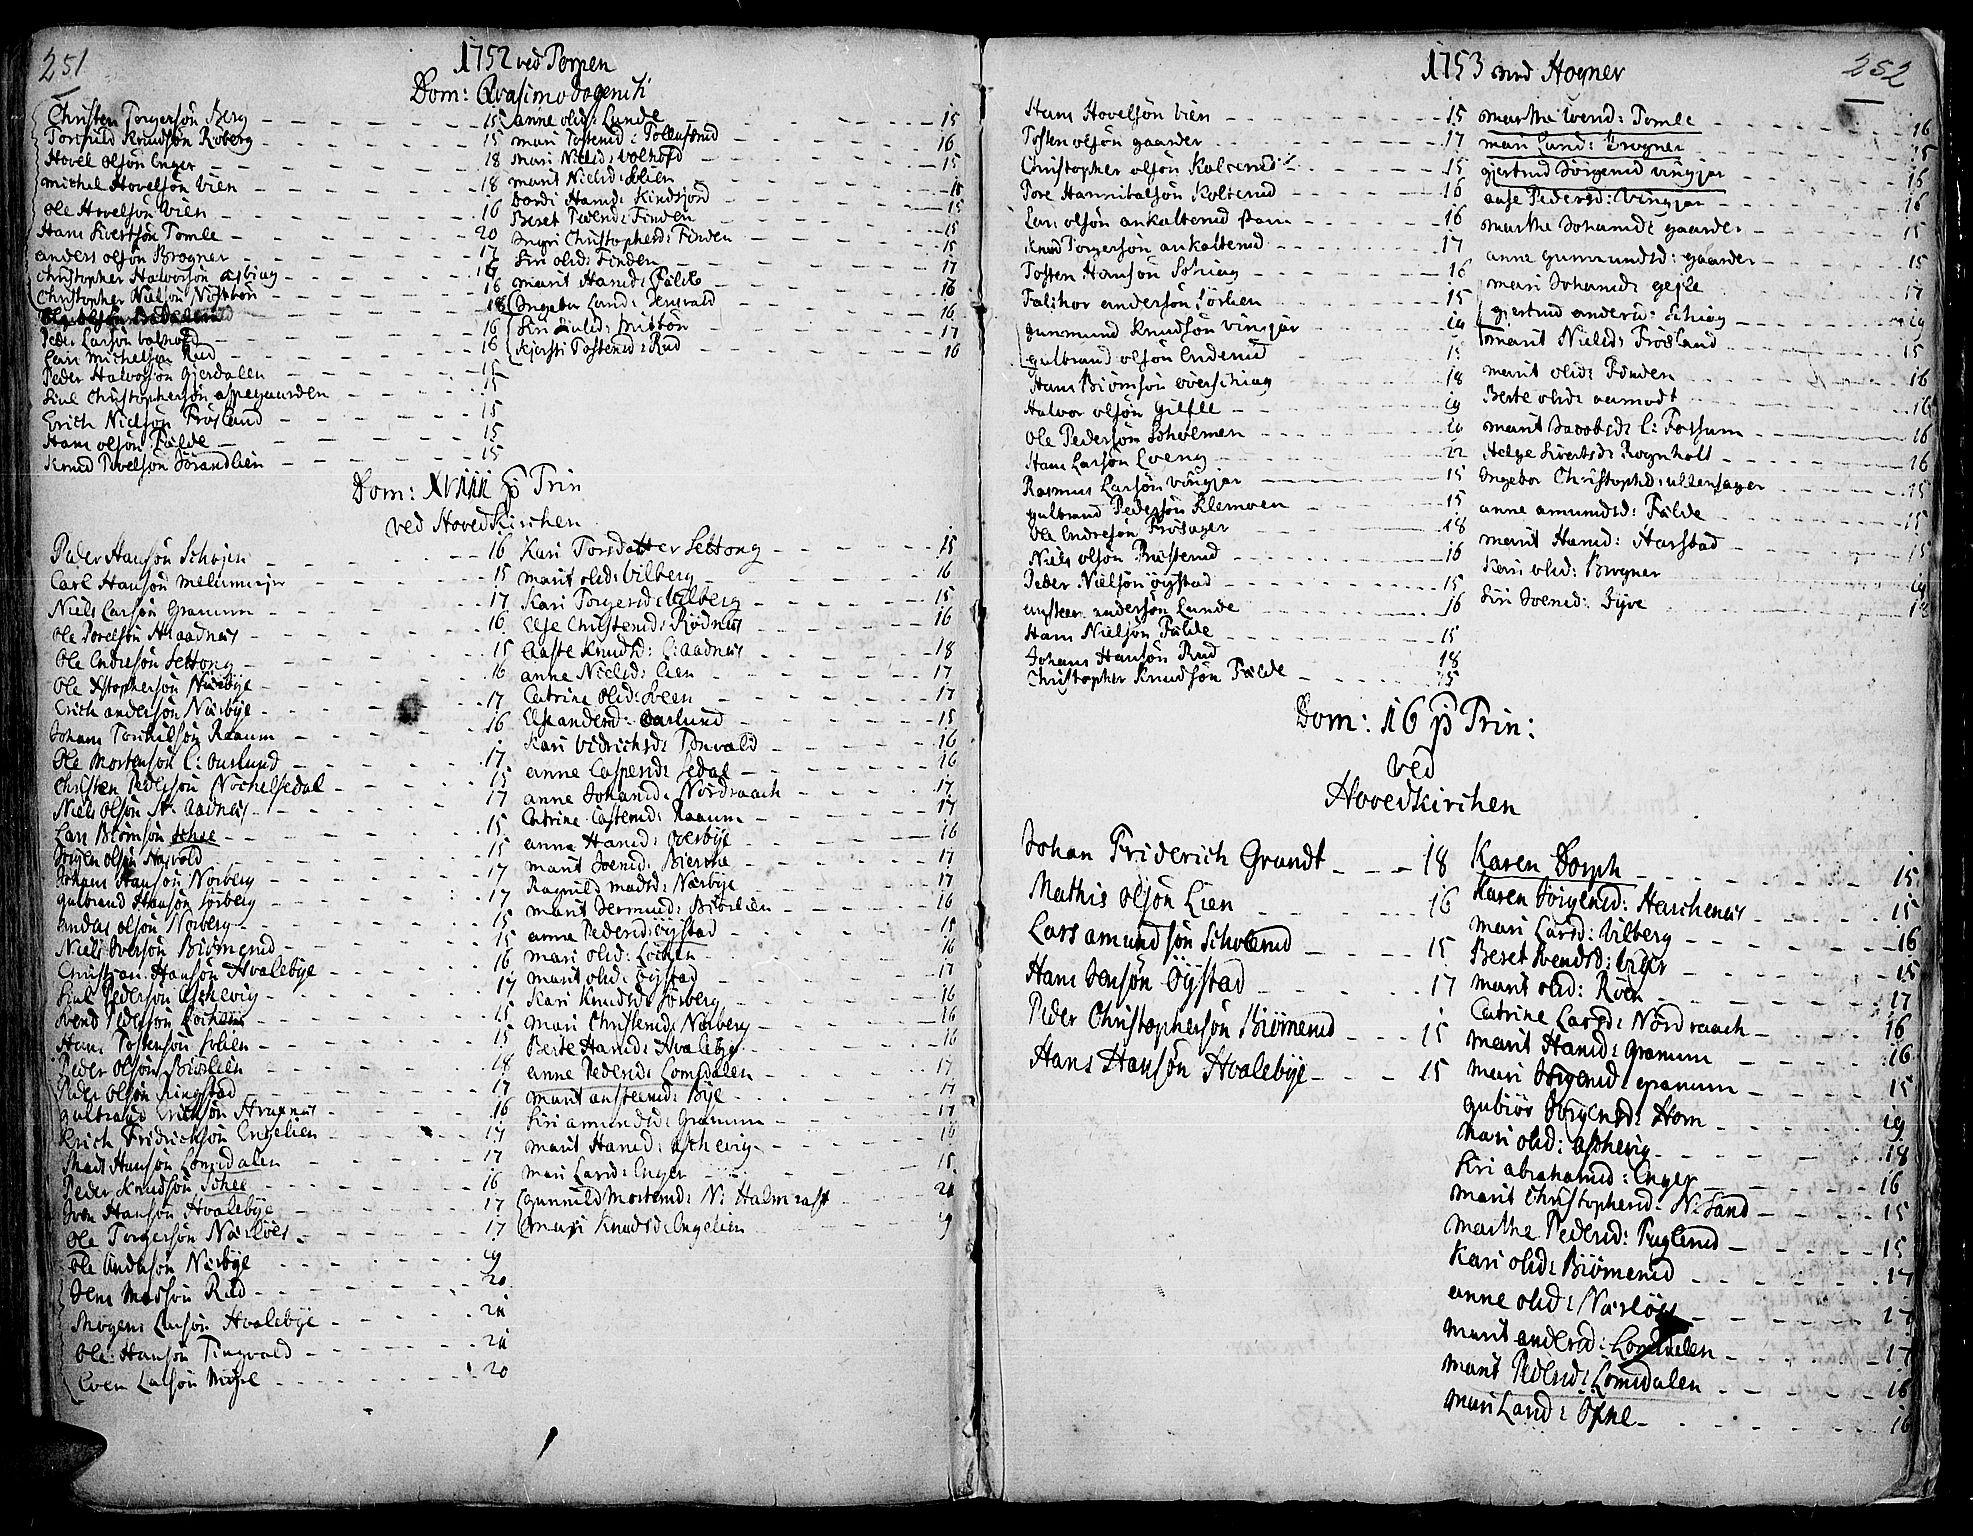 SAH, Land prestekontor, Ministerialbok nr. 2, 1733-1764, s. 251-252